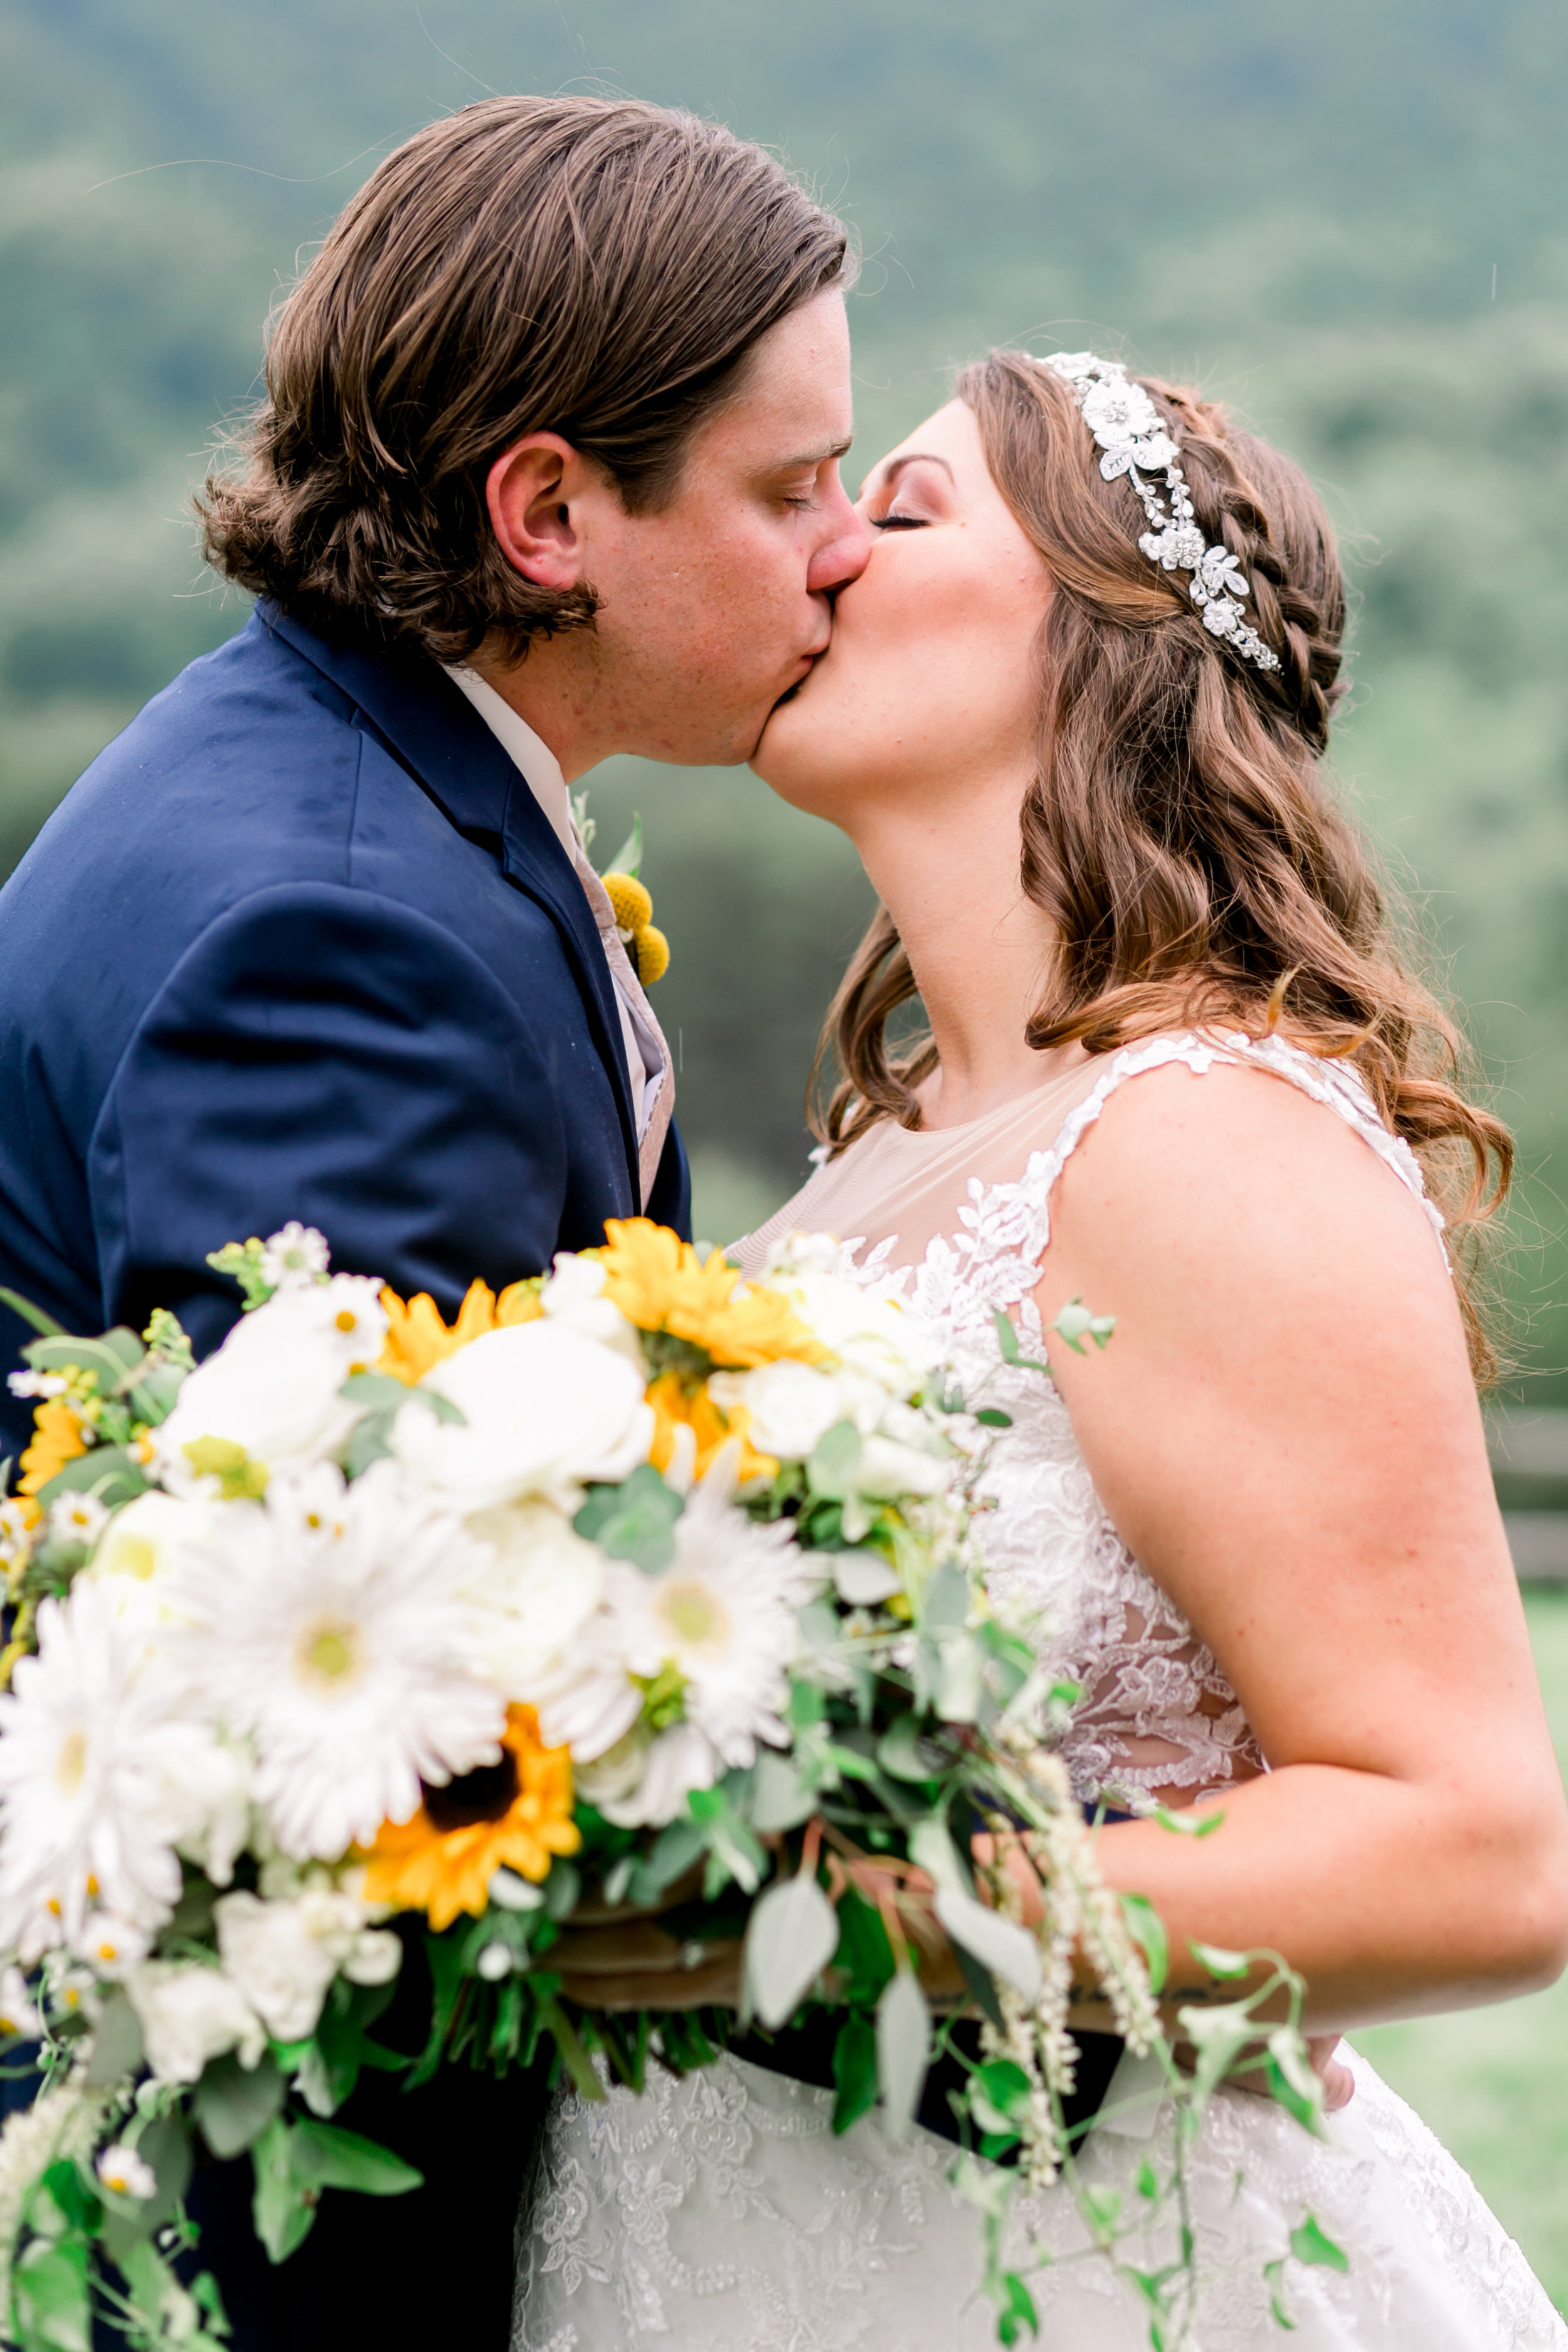 Joy-Unscripted-Wedding-Calligraphy-Kendall-12.jpg